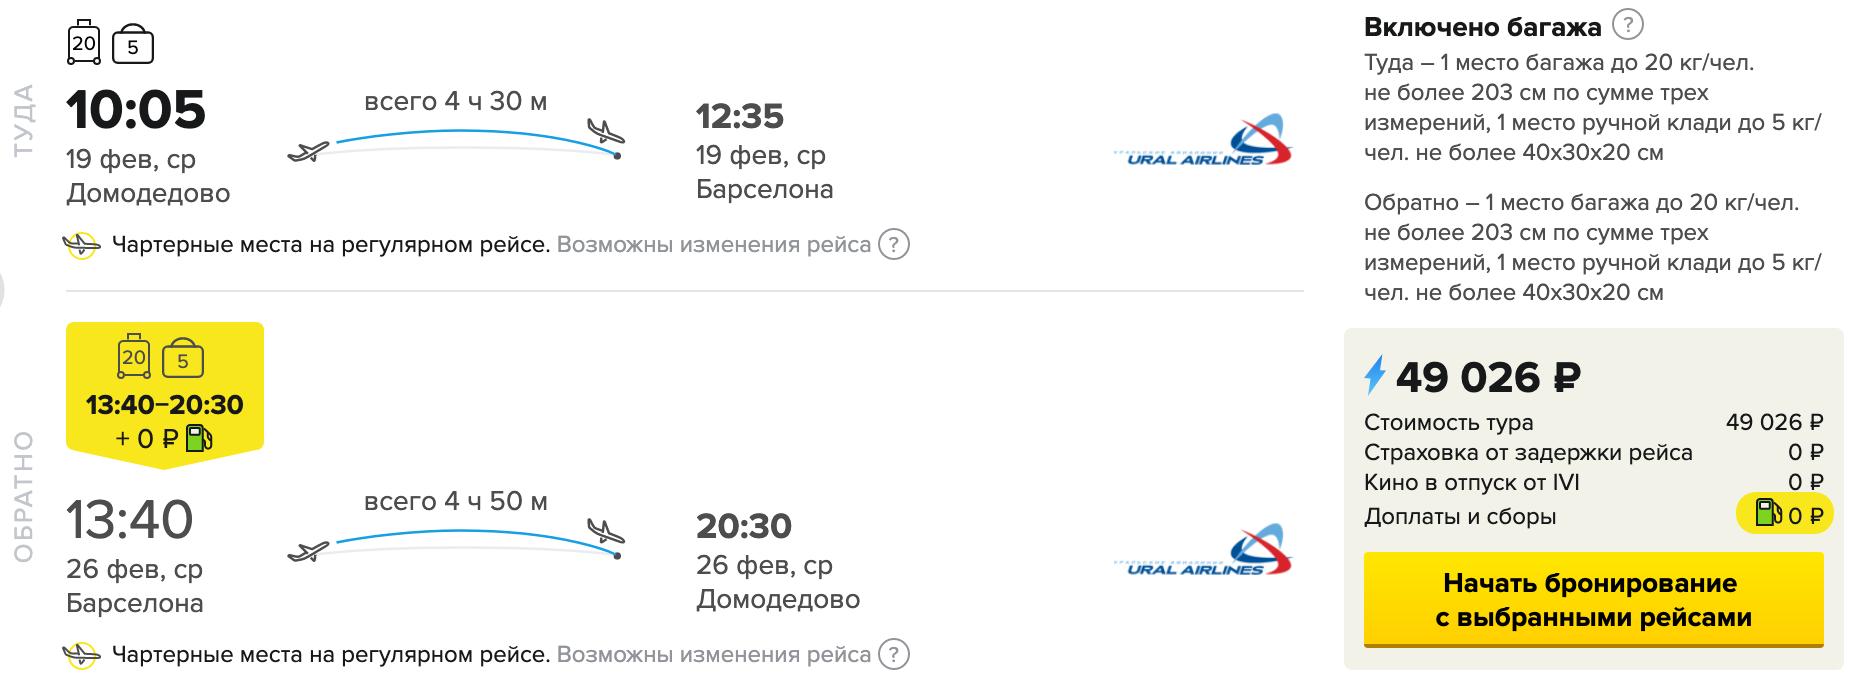 Тур Москва - Барселона - Москва